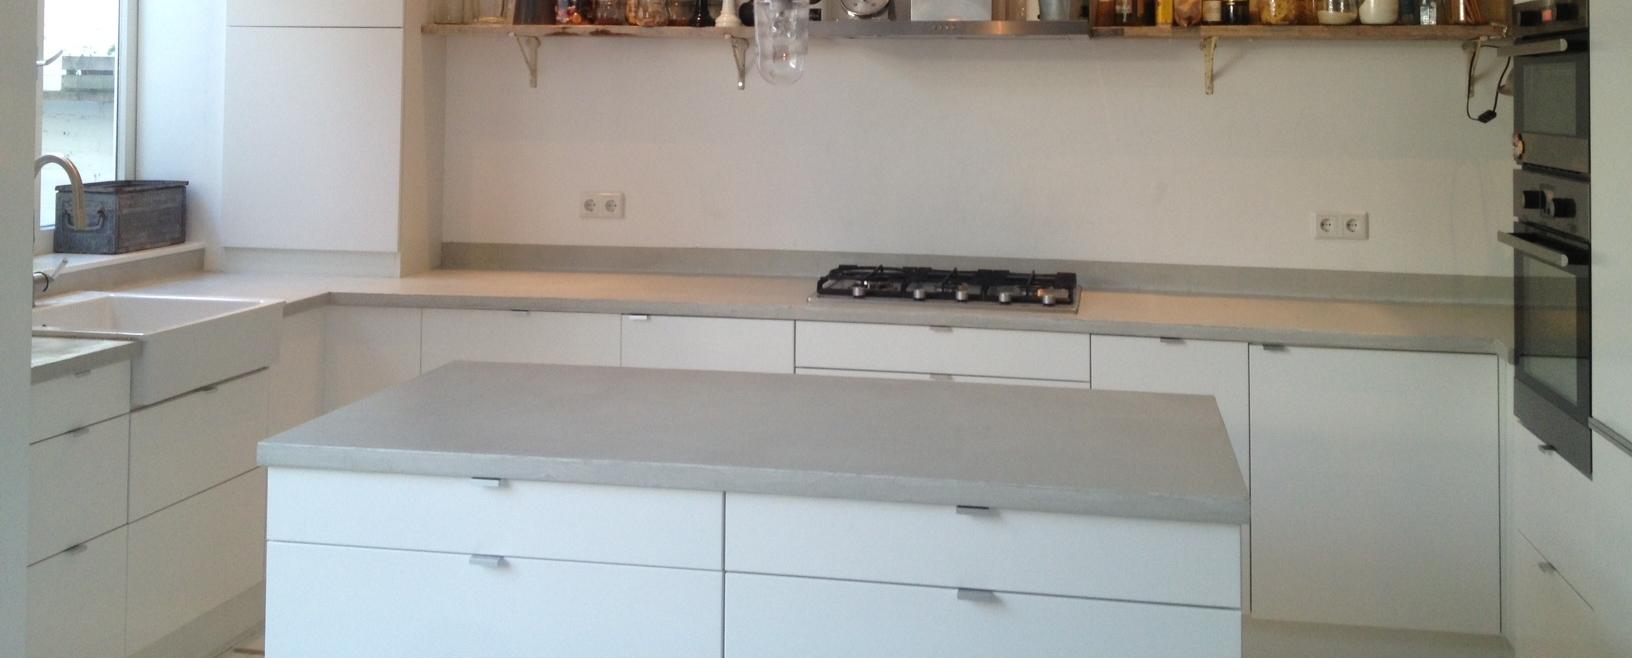 Beton Keuken Kosten : Beton Cire keuken jpeg – Beton Cir? Centrum